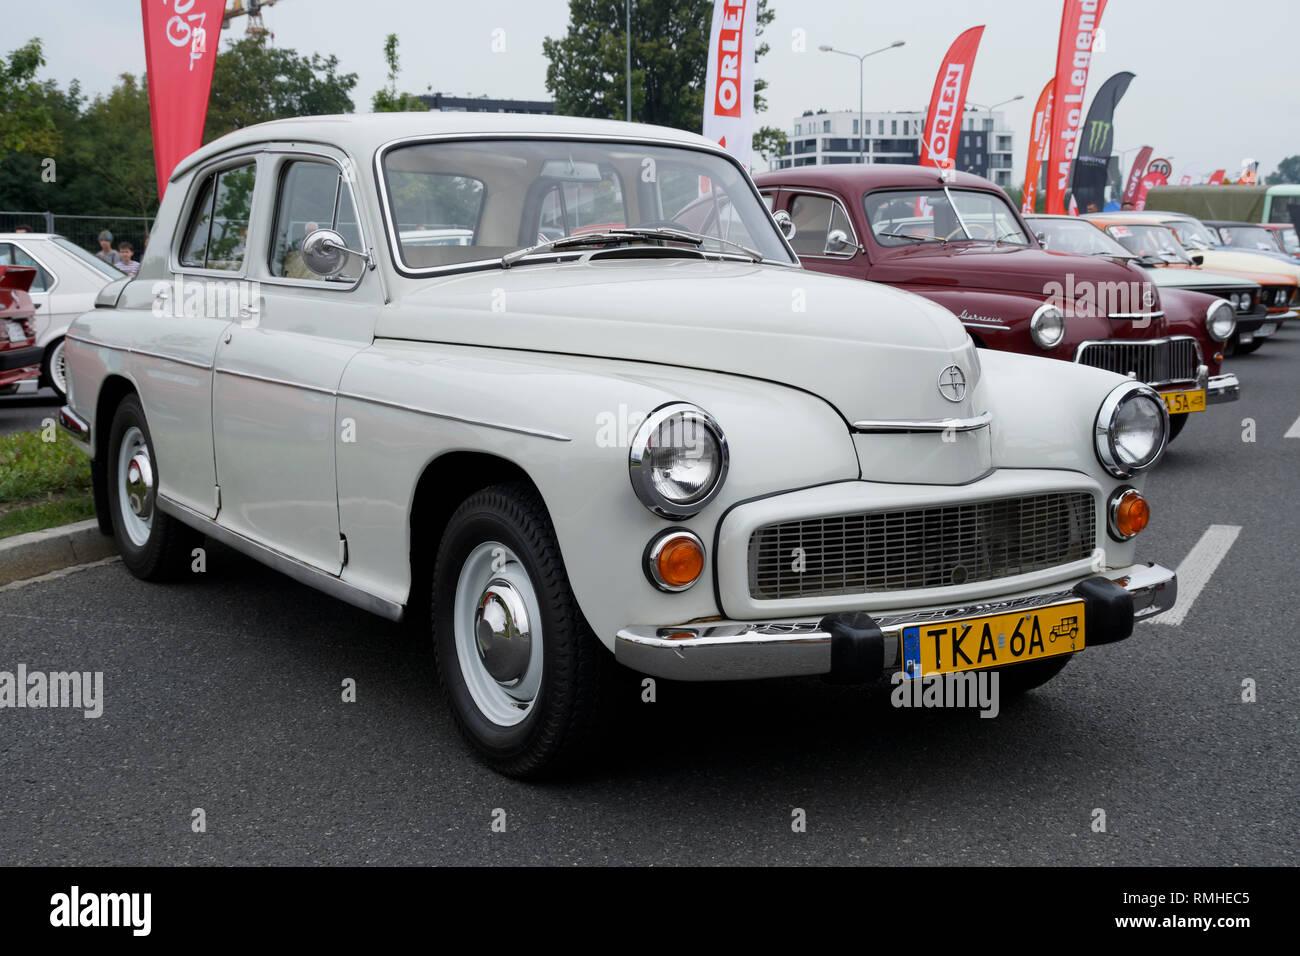 Warszawa car. Oldtimers car at Verva Street Racing on 2018-09-08 in Krakow, Poland. - Stock Image